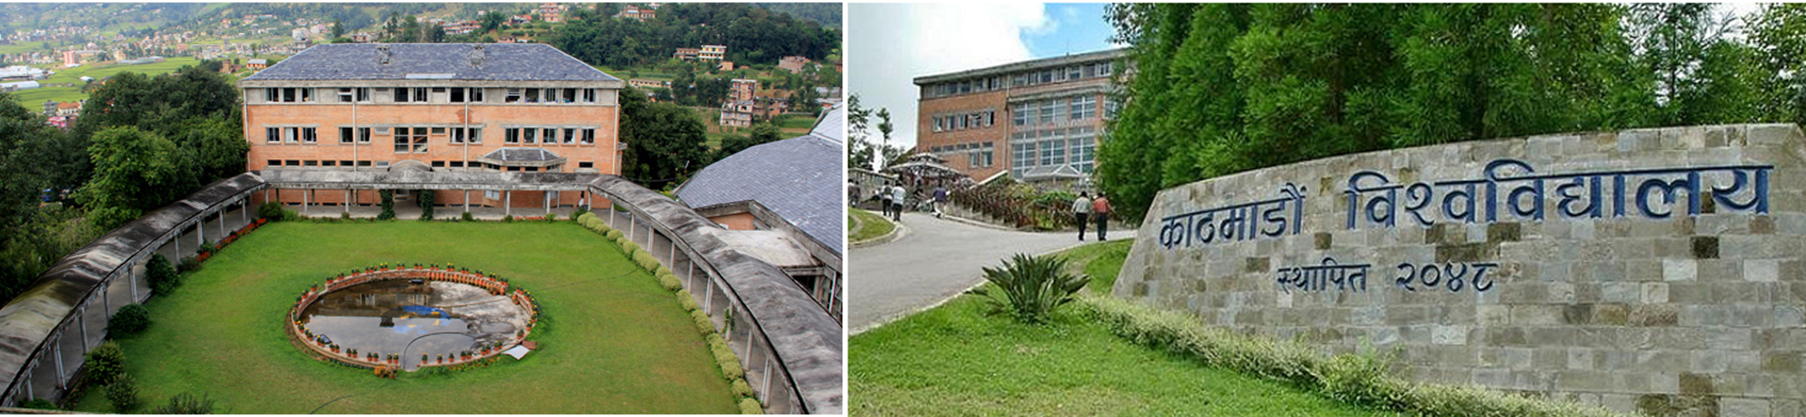 Kathmandu University School of Engineering